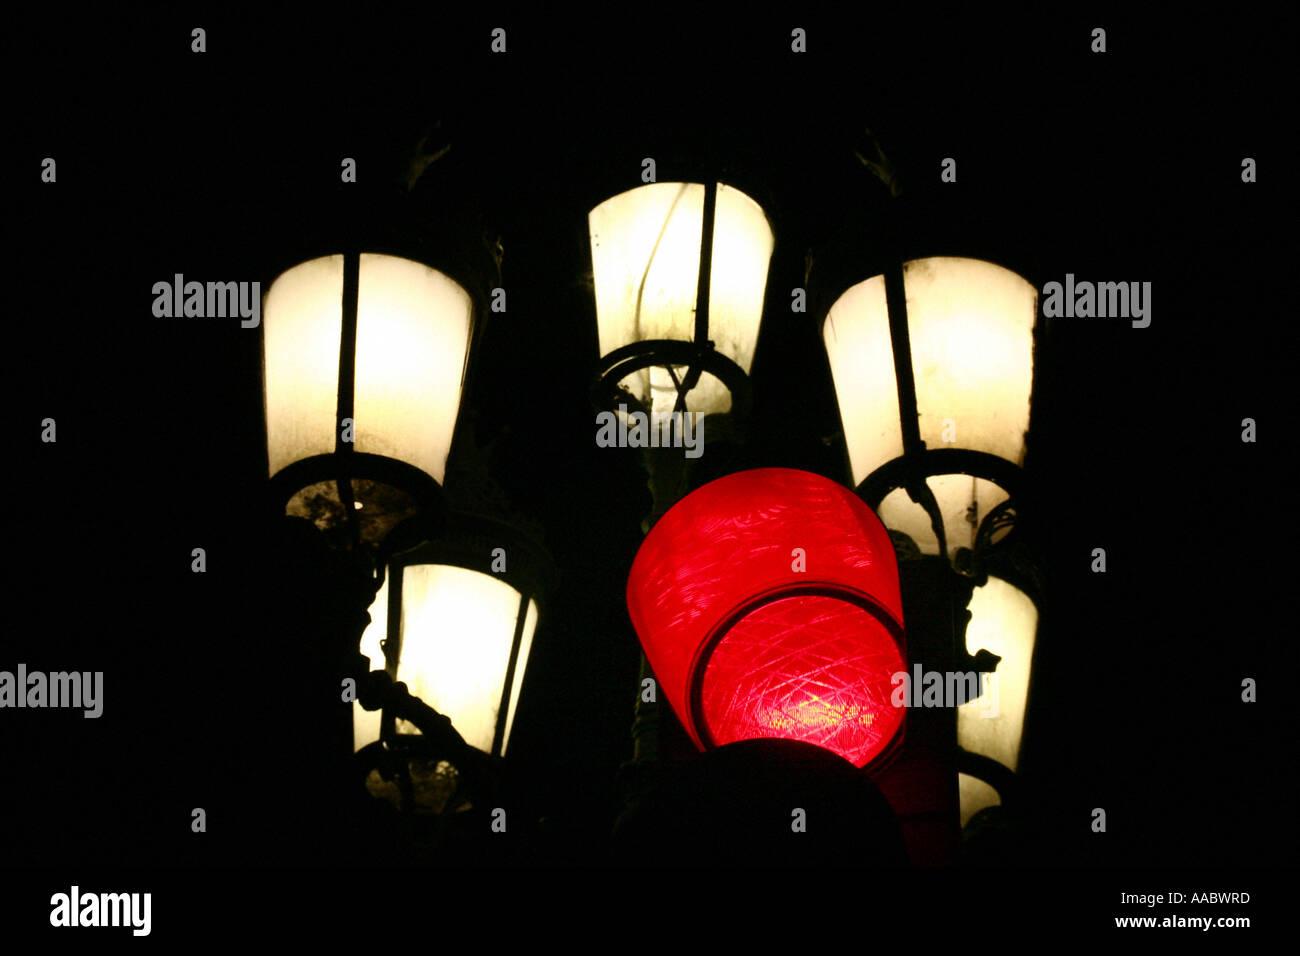 Laternen - Kandelaver Stock Photo, Royalty Free Image: 7189052 - Alamy